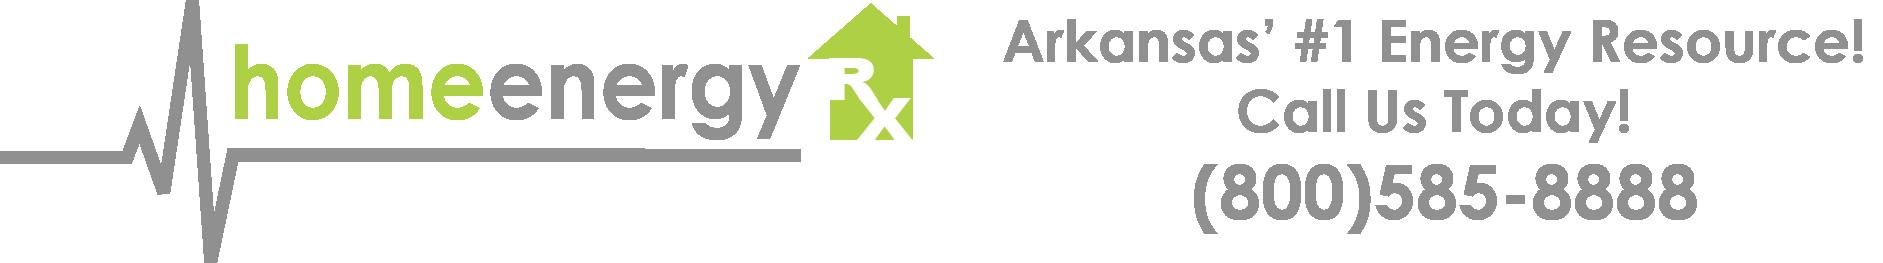 Home Energy Rx – (800) 585-8888